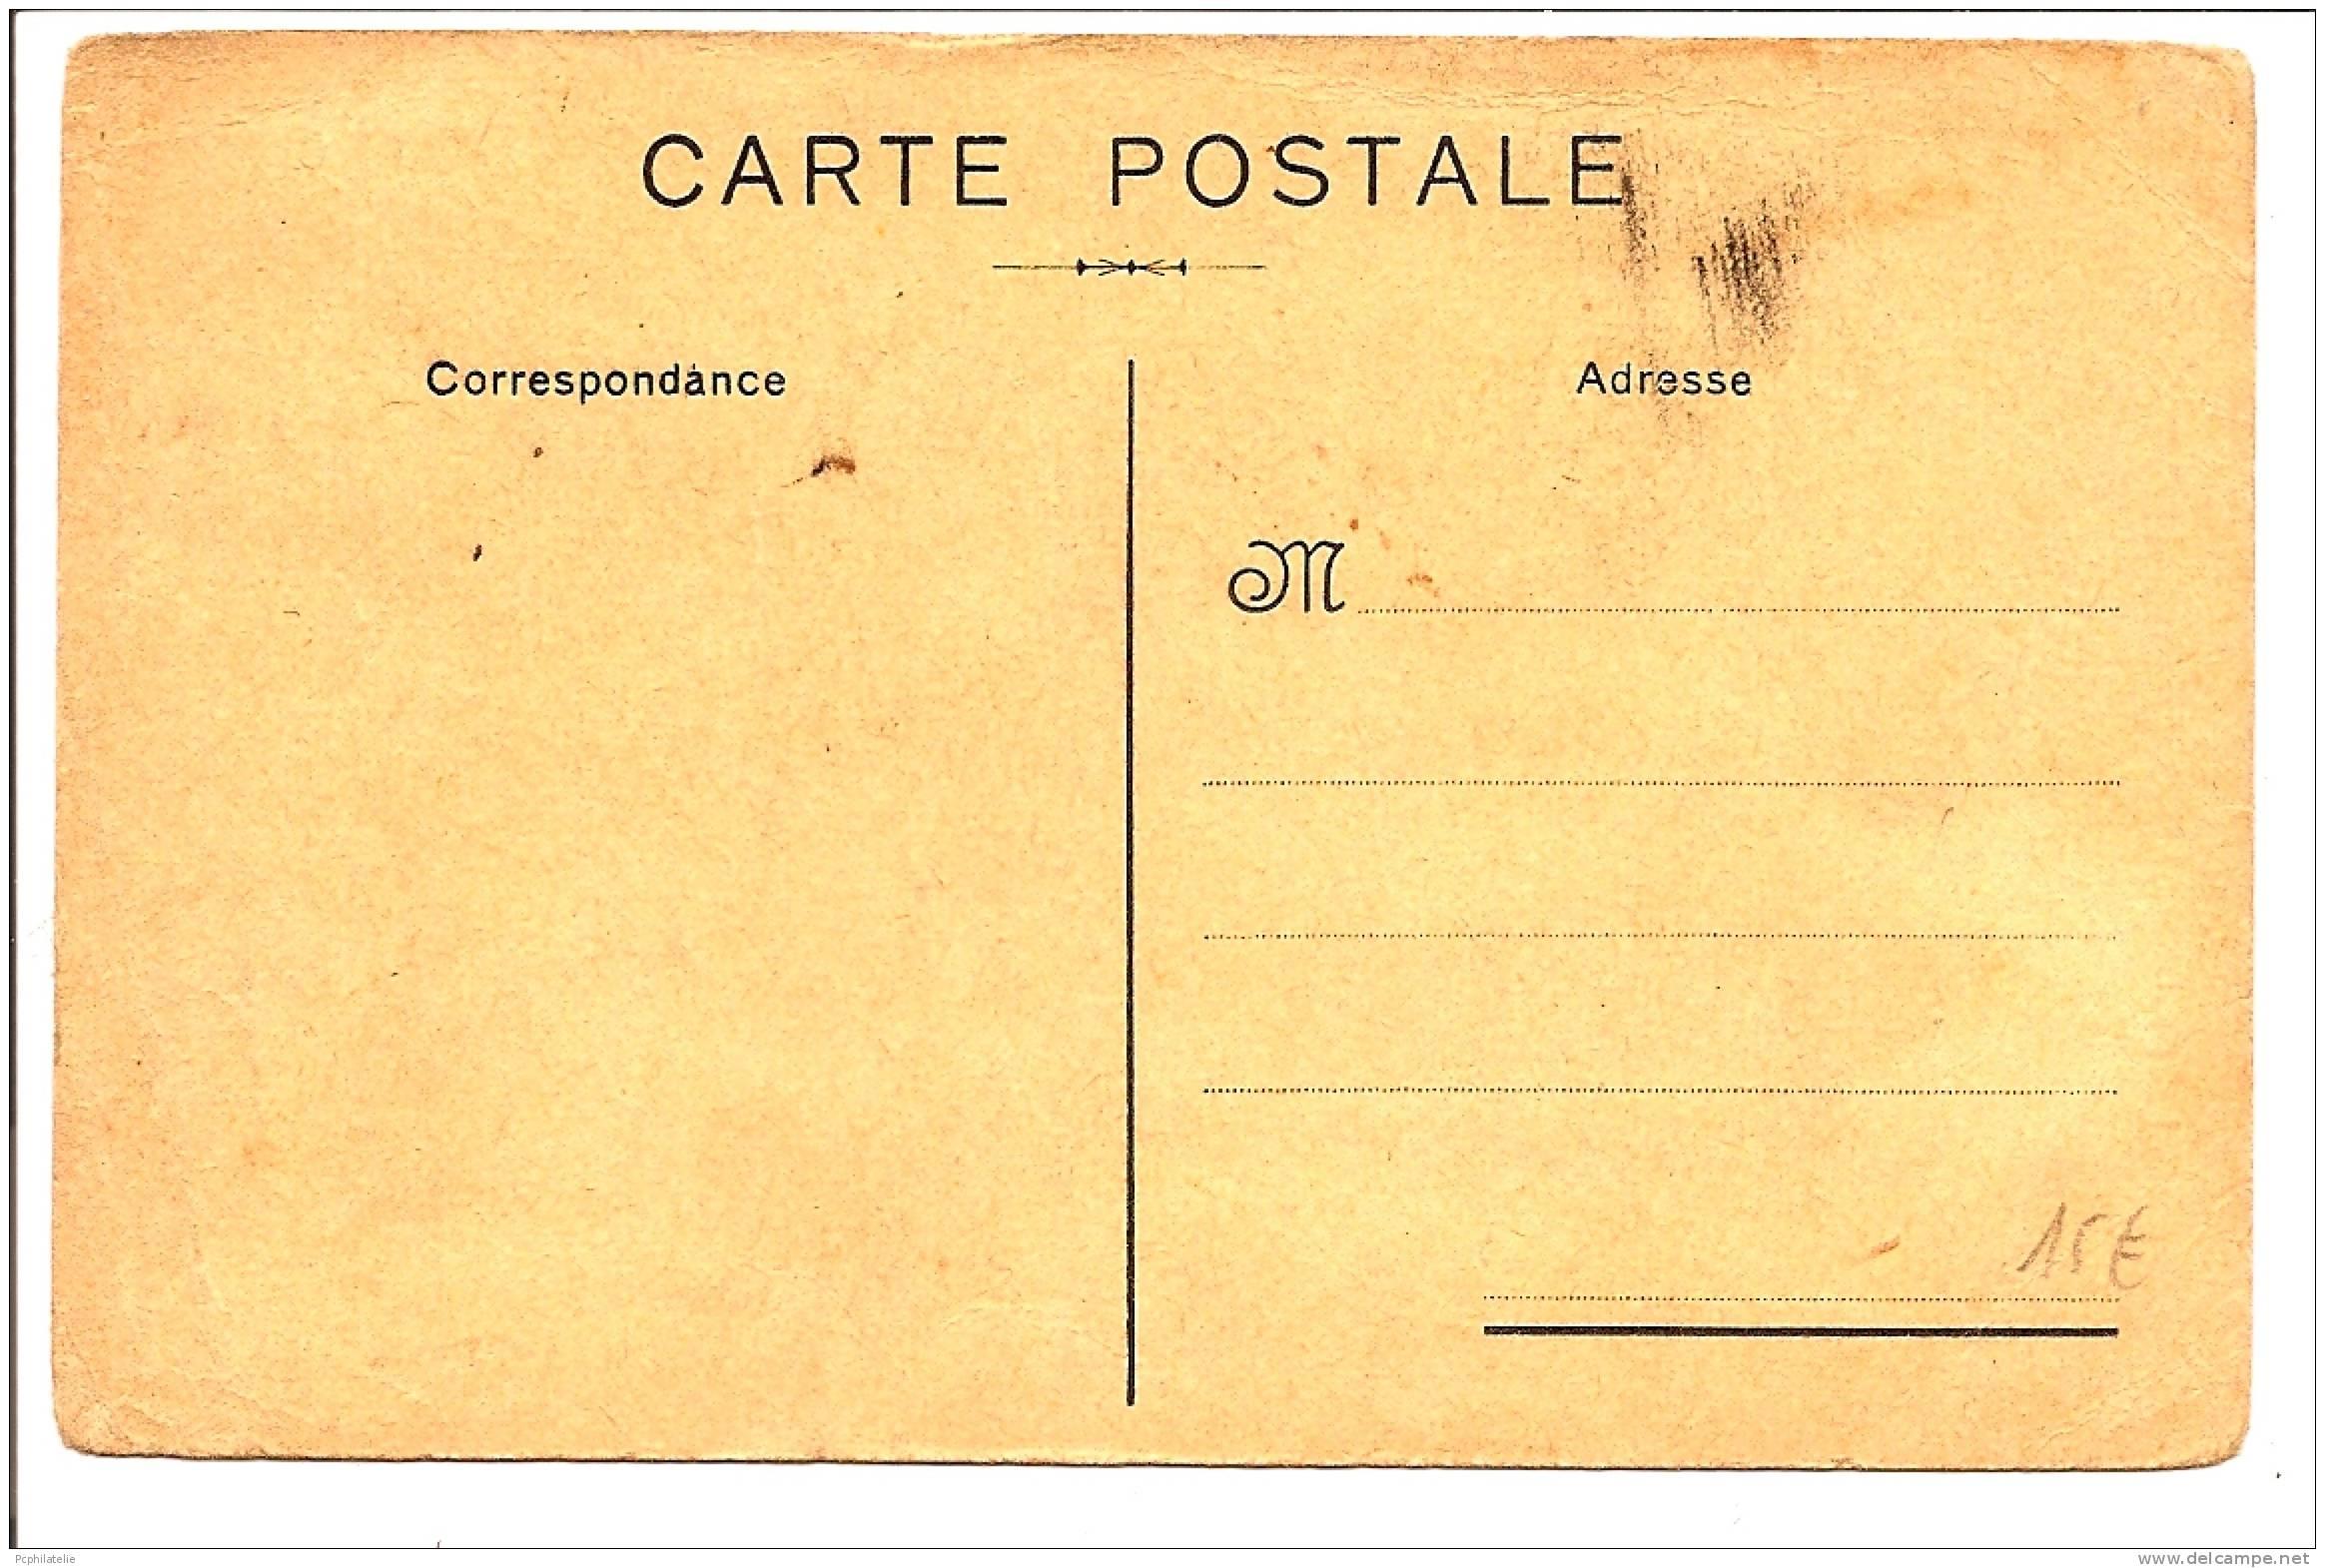 deuxi me guerre mondiale carte postale humoristique anti hitler 1944. Black Bedroom Furniture Sets. Home Design Ideas